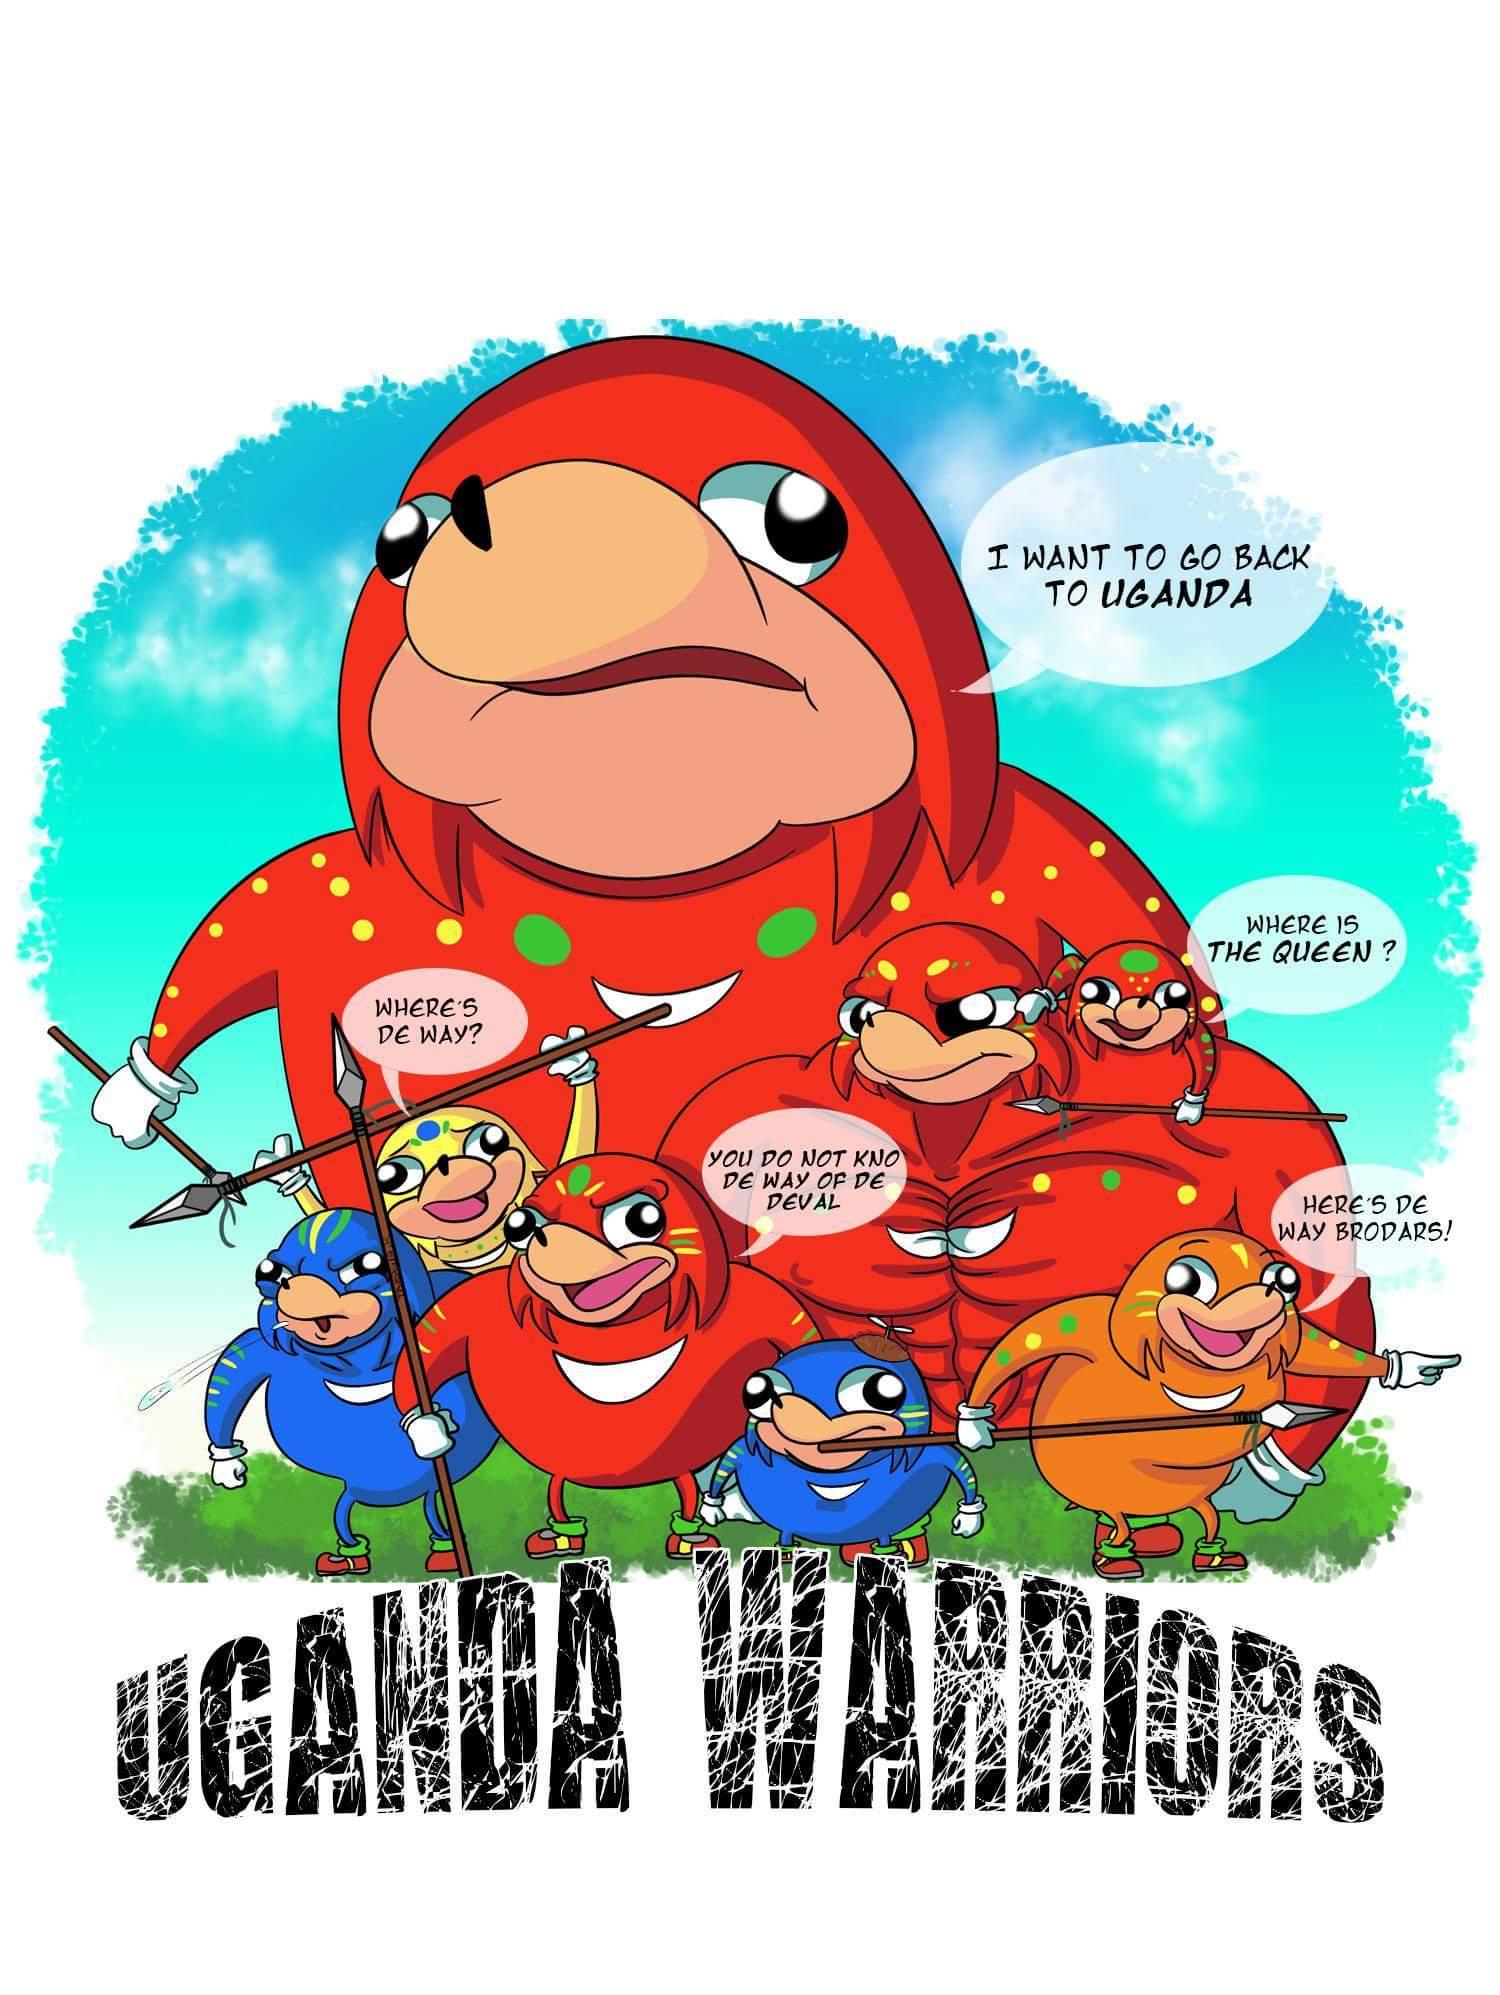 The uganda way - meme